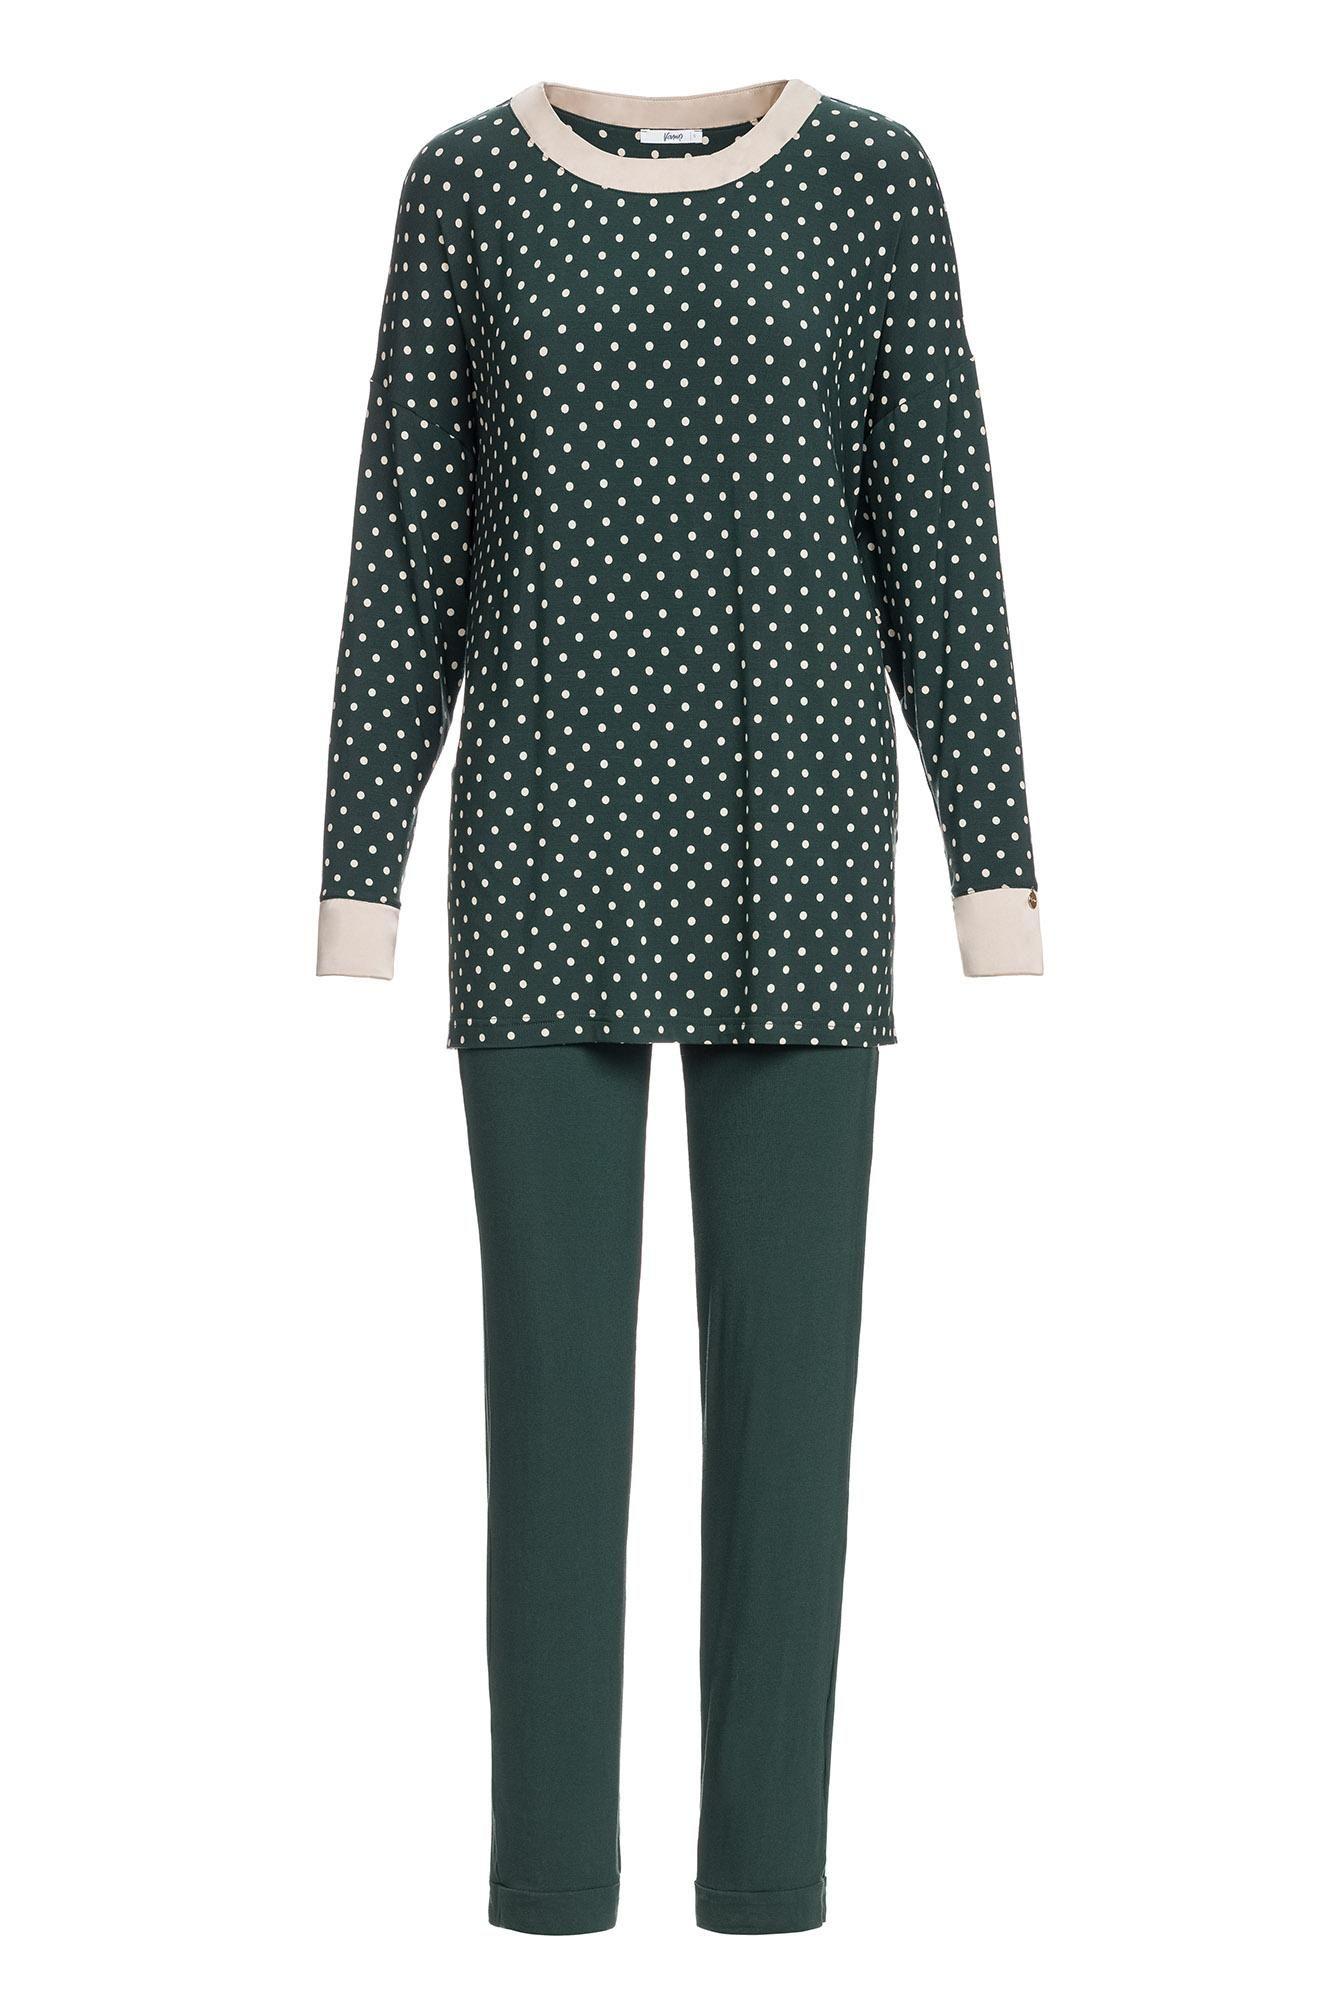 Women's Polka Dot Pyjamas Plus Size